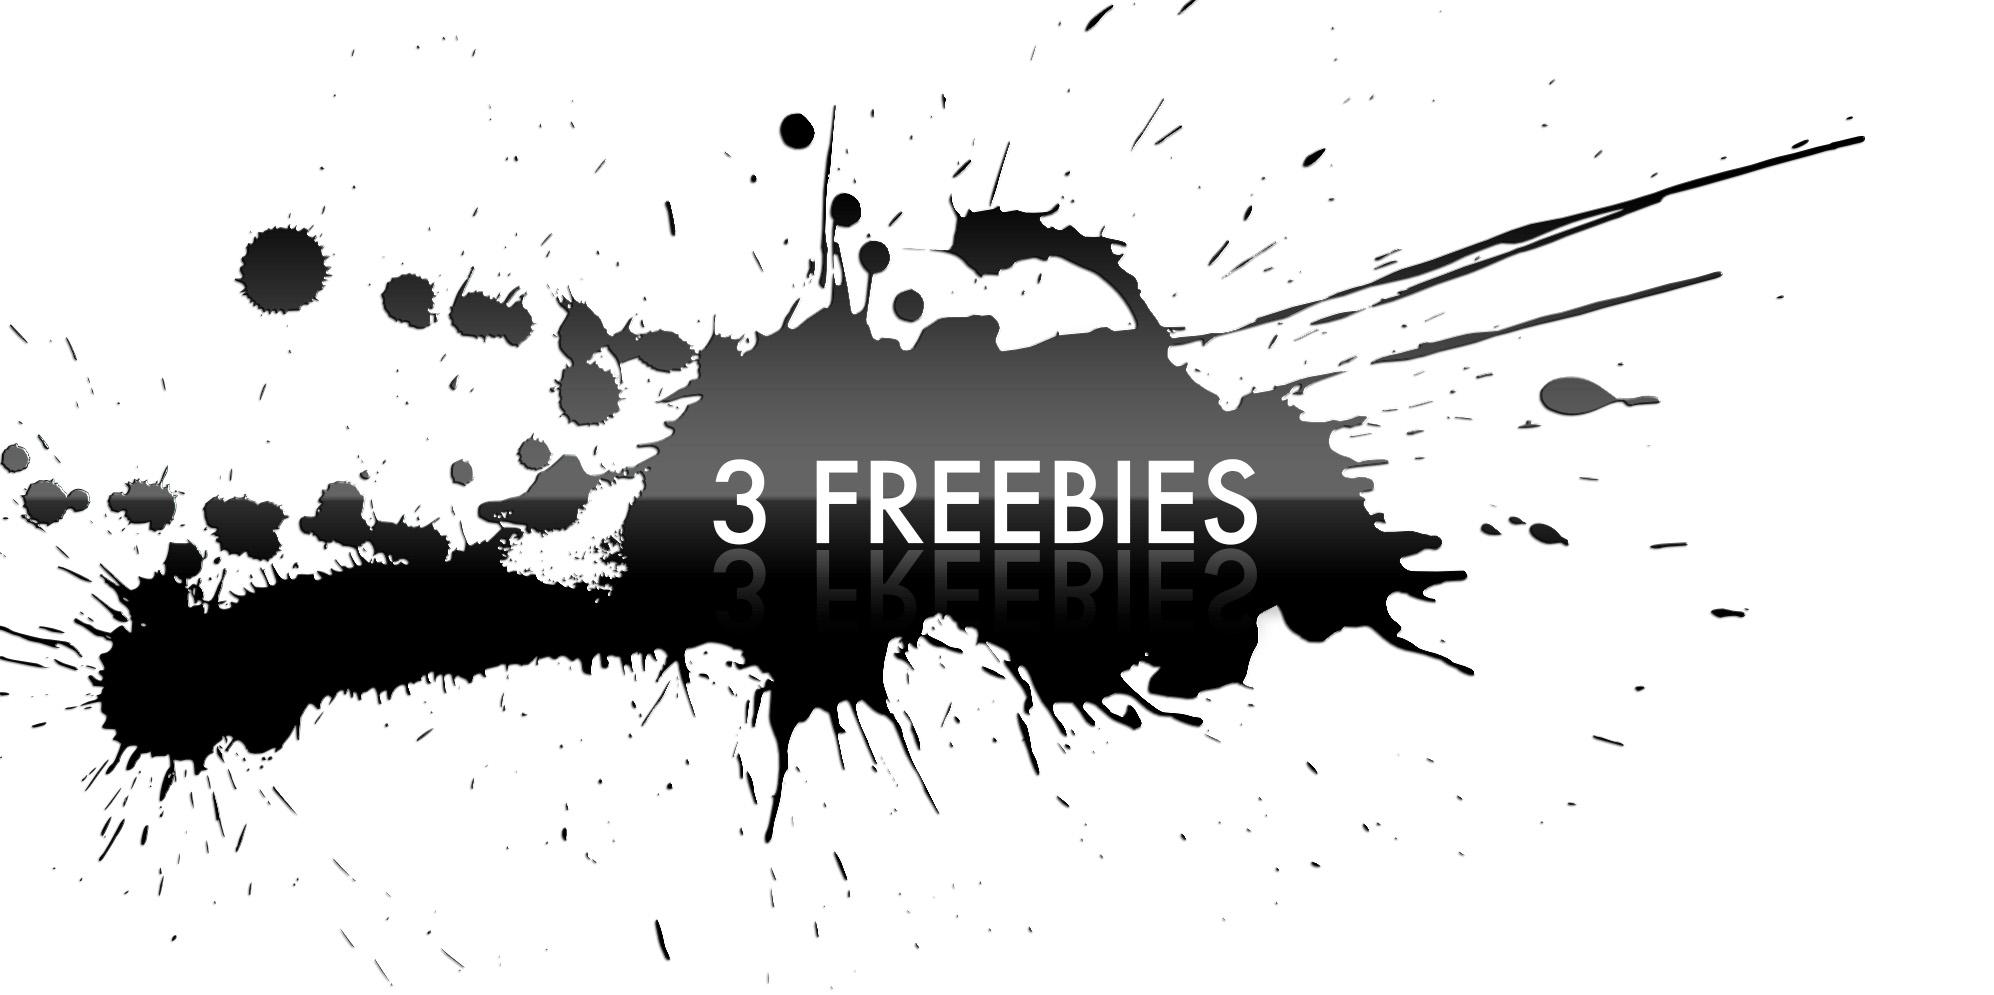 3 Freebies - Splash.jpg